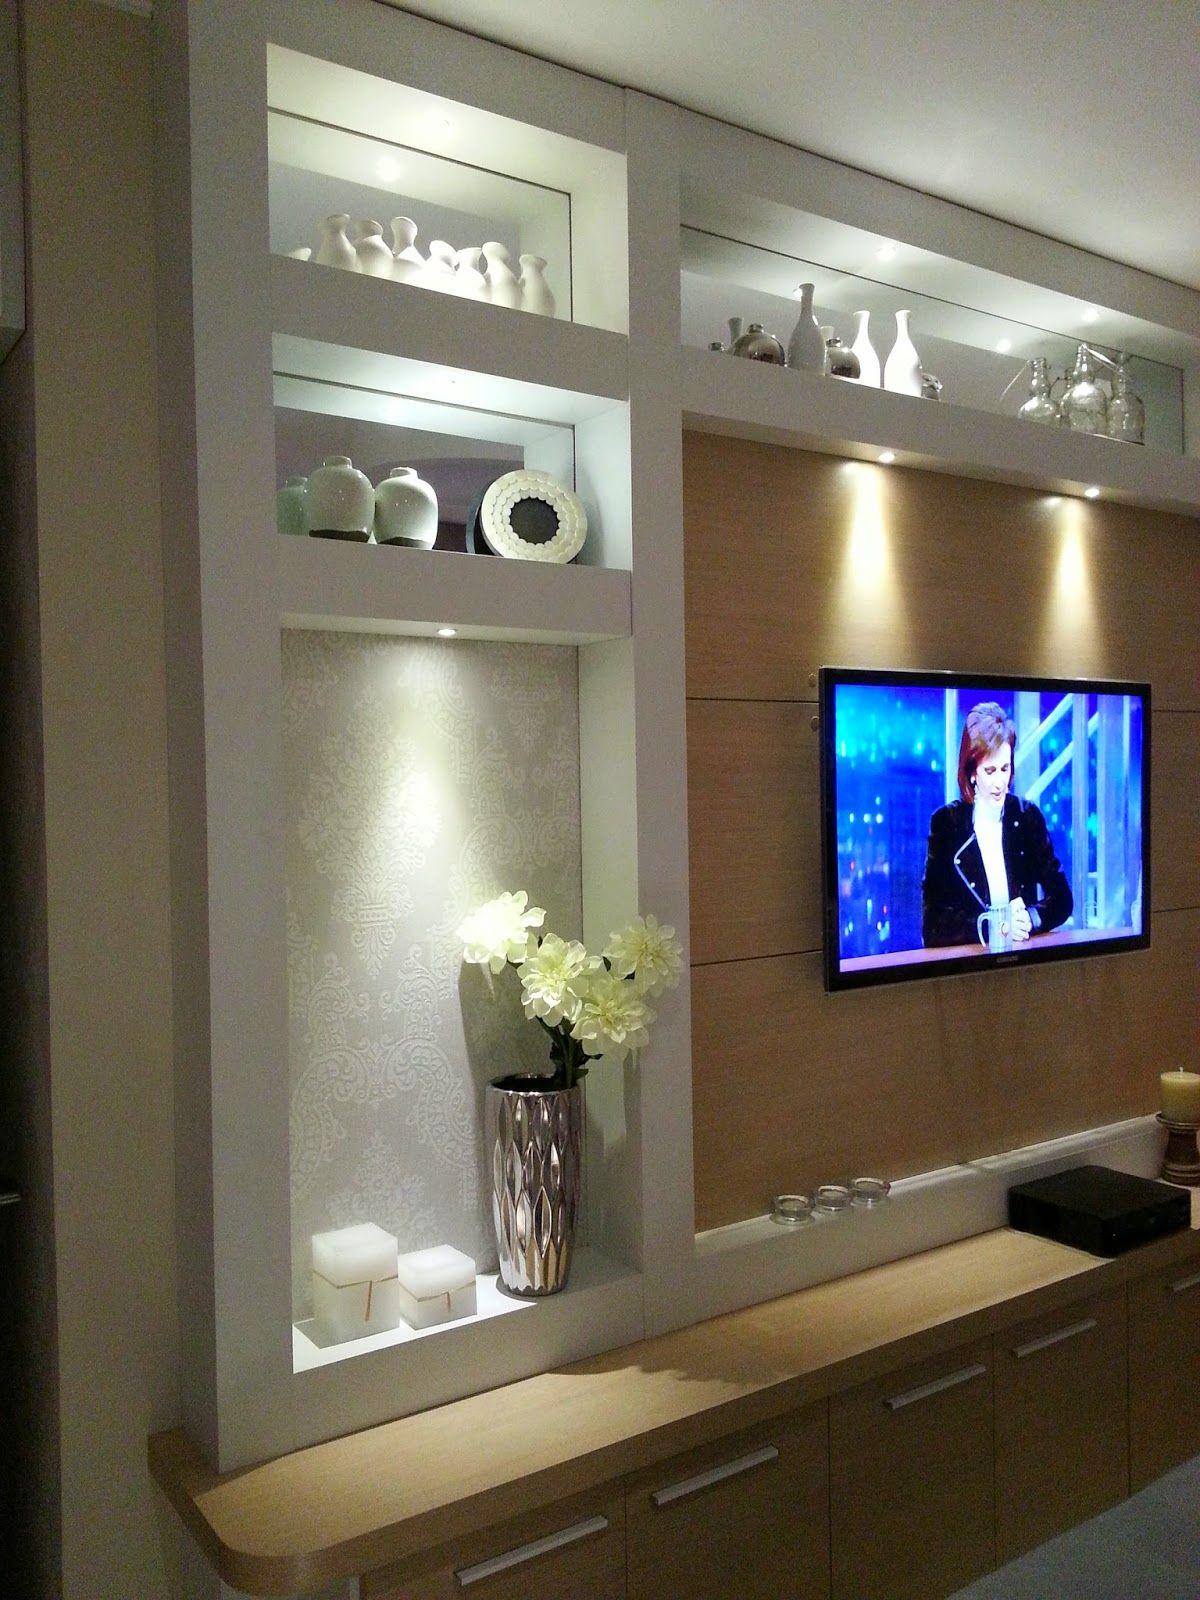 Arquitetura e interiores dise o de la zona tv for Curso de decoracion de interiores zona norte